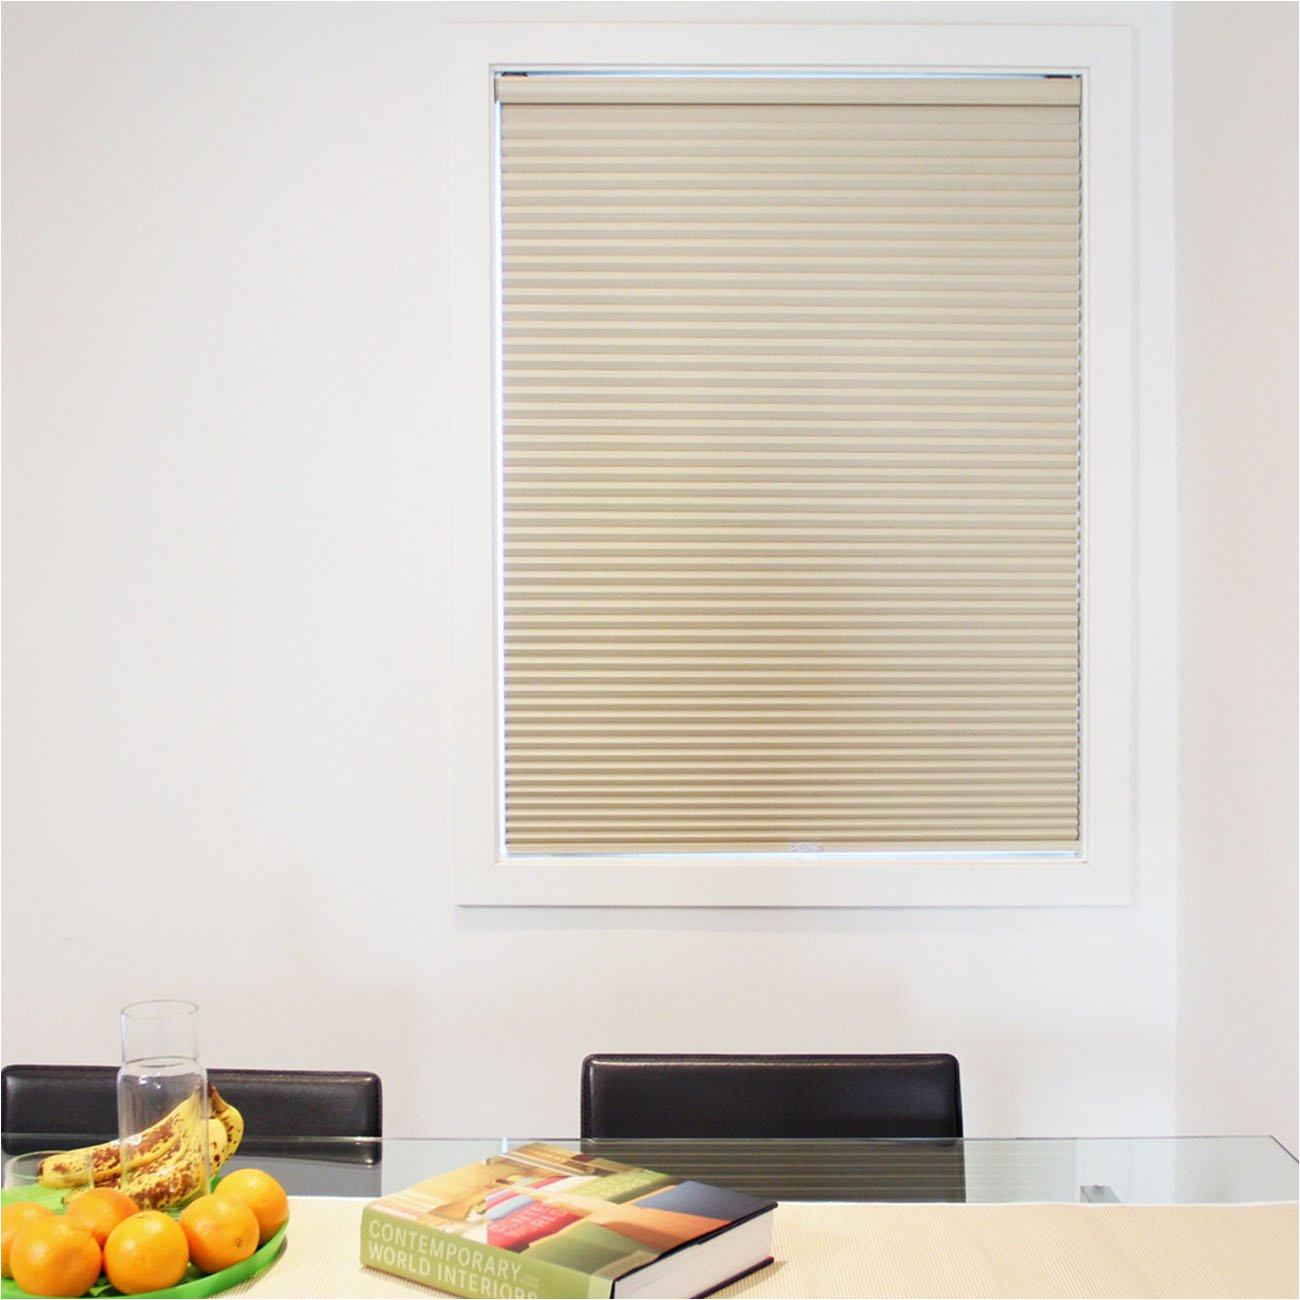 amazon com chicology cordless cellular shade blackout fabric secret tapioca beige 36 x72 home kitchen